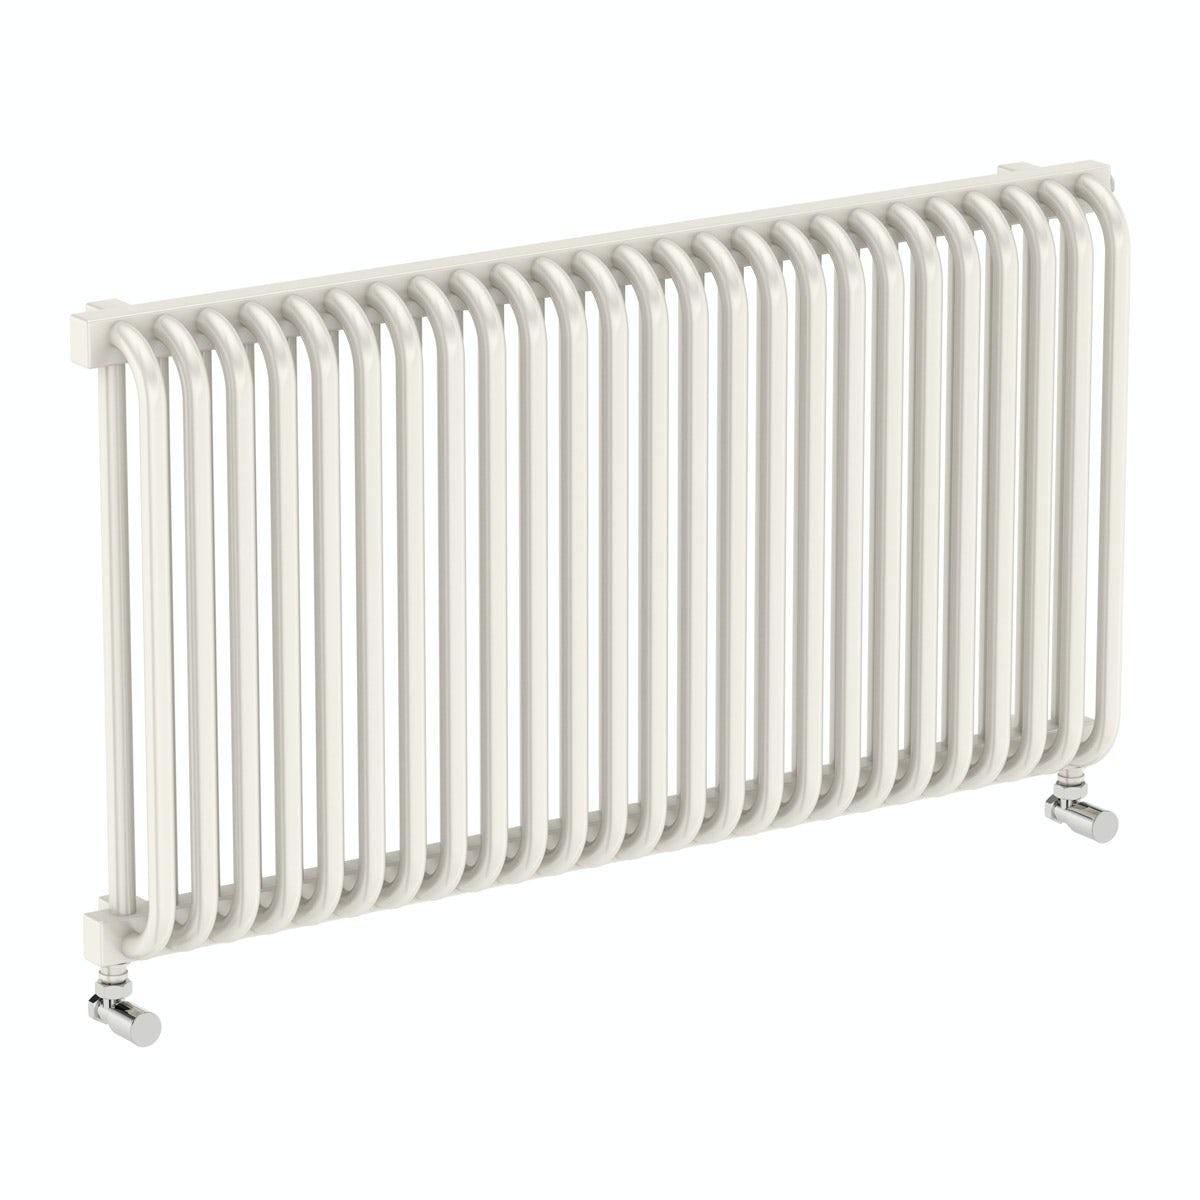 Terma Delfin soft white horizontal radiator 540 x 1020